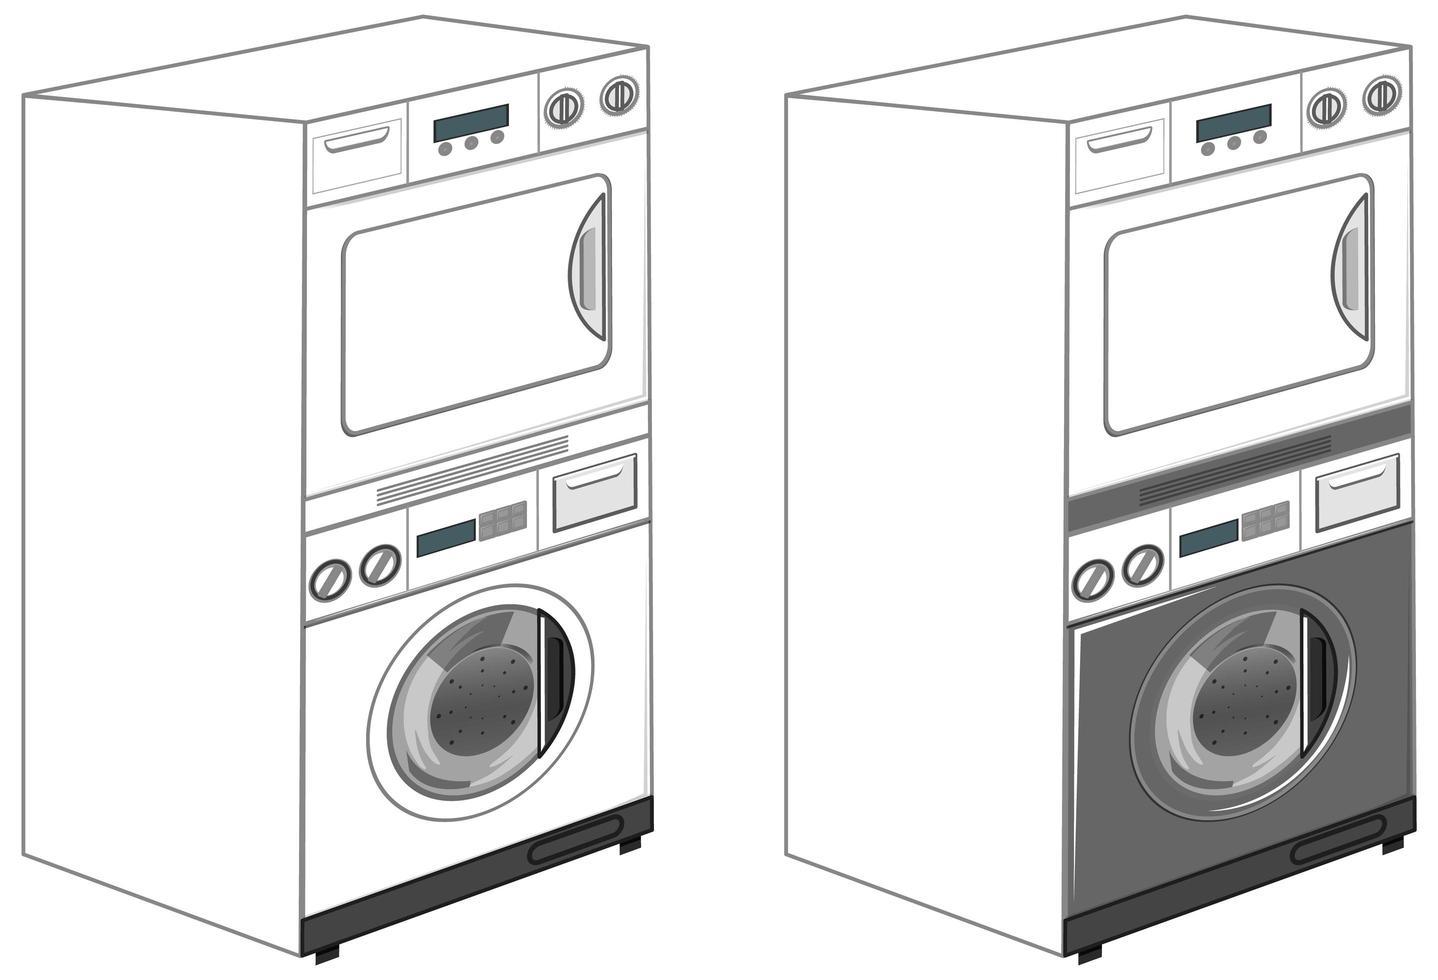 lavadoras aisladas sobre fondo blanco vector